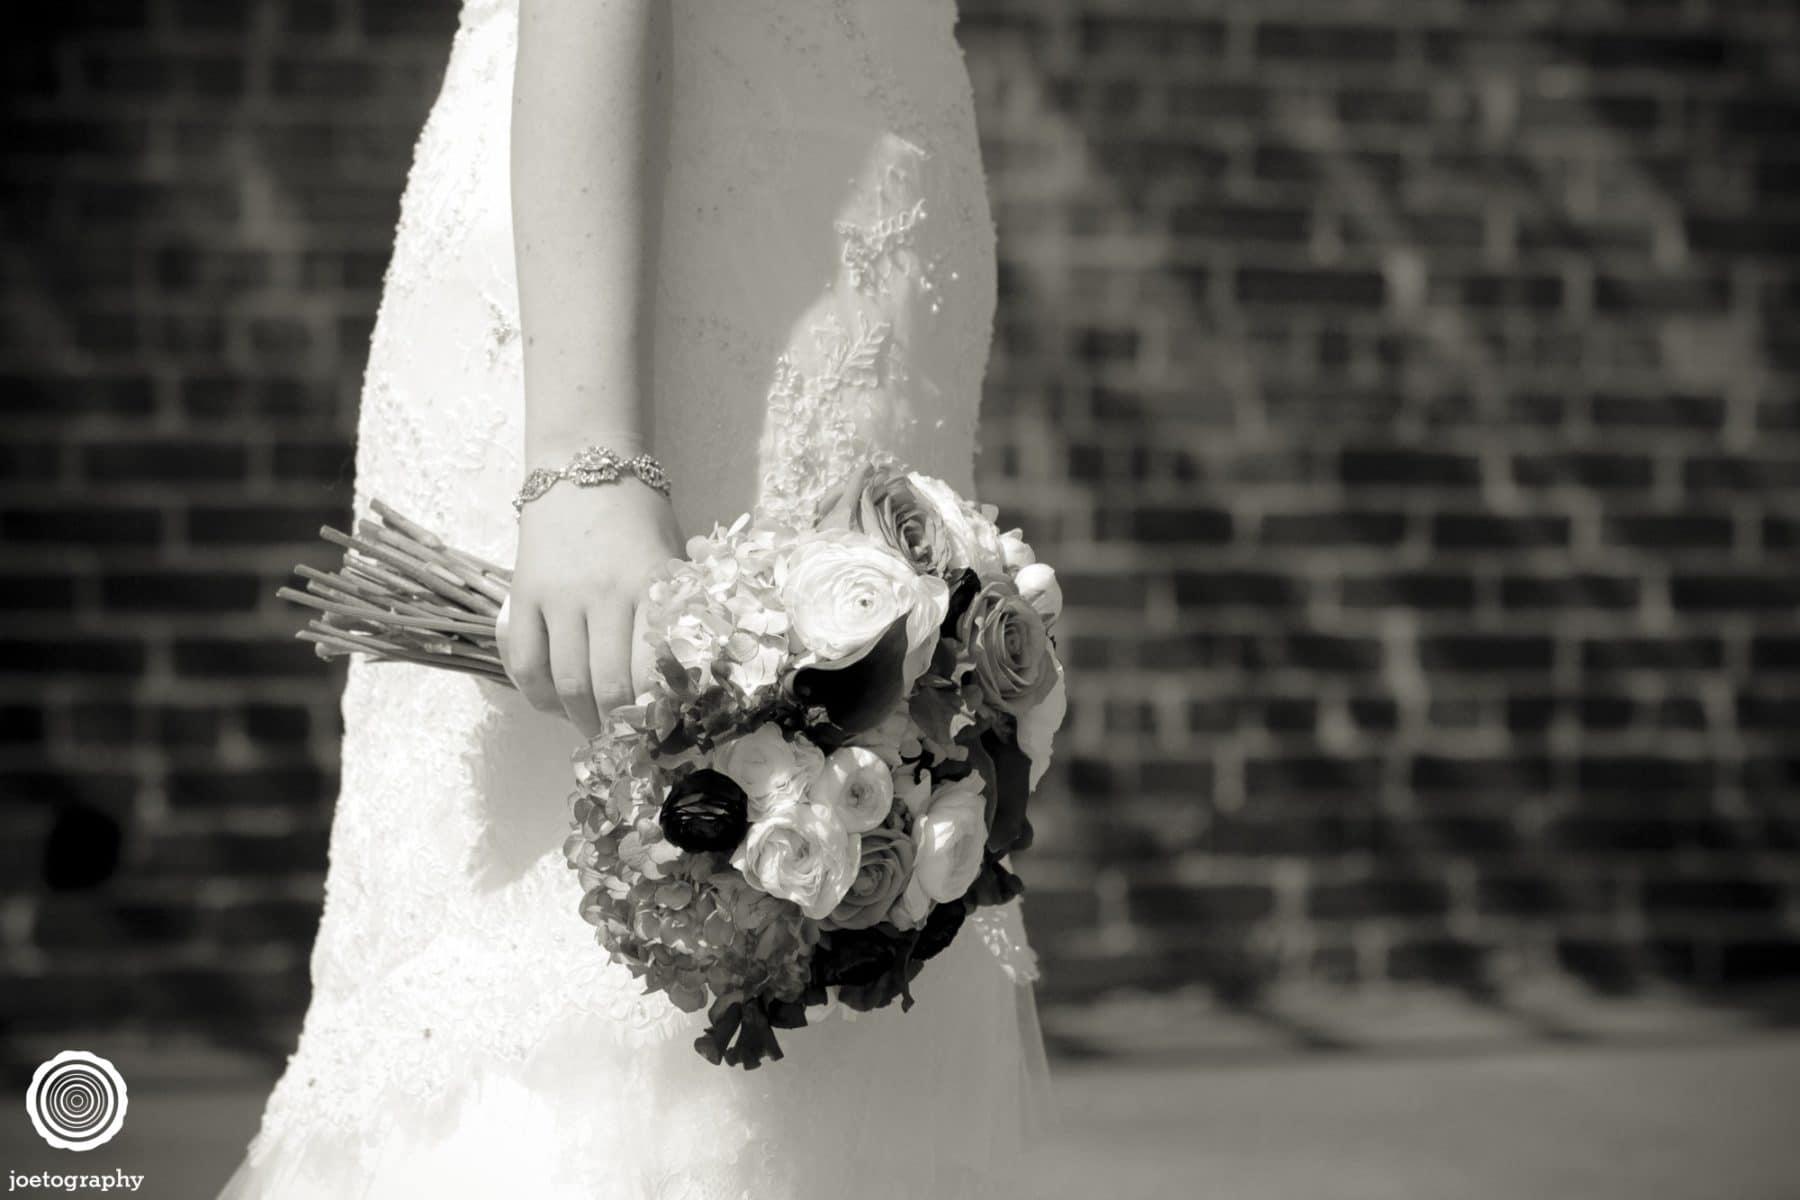 Gutwein-Wedding-Photography-Indianapolis-Indiana-29